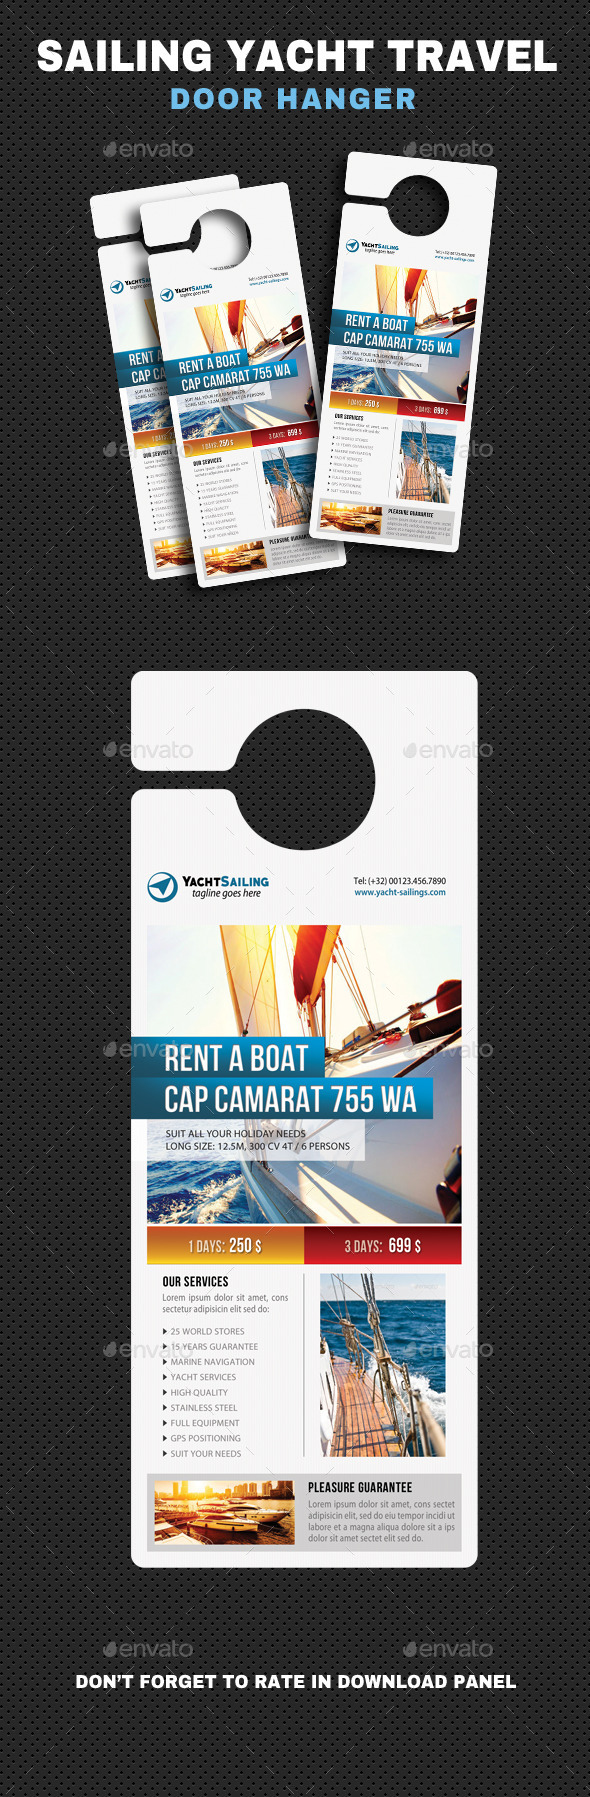 Sailing Yacht Travel Door Hanger V03 - Events Flyers